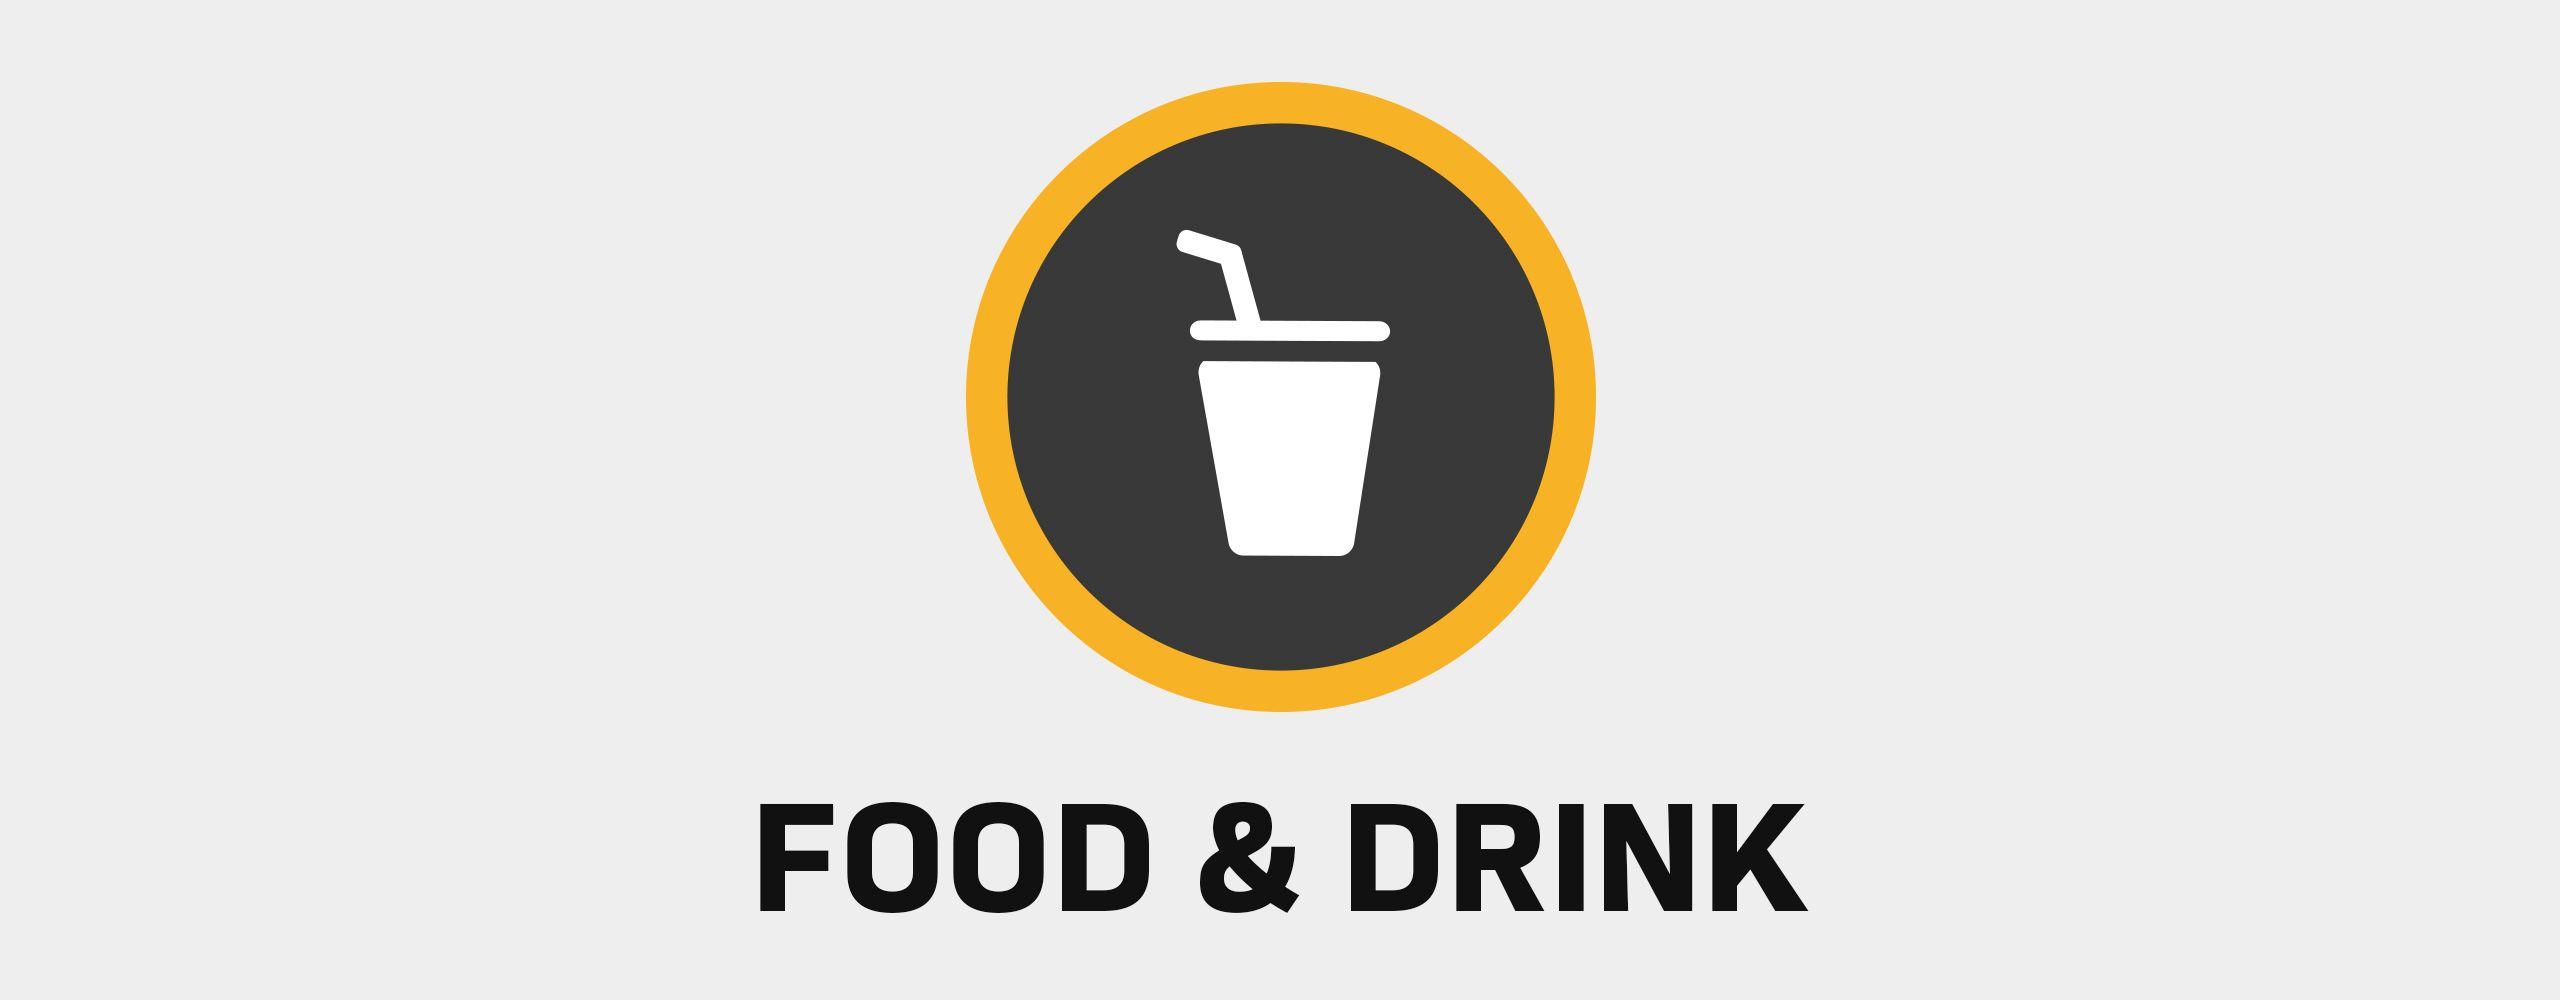 Heinz_Field_Gameday_Icon_Food_Drink